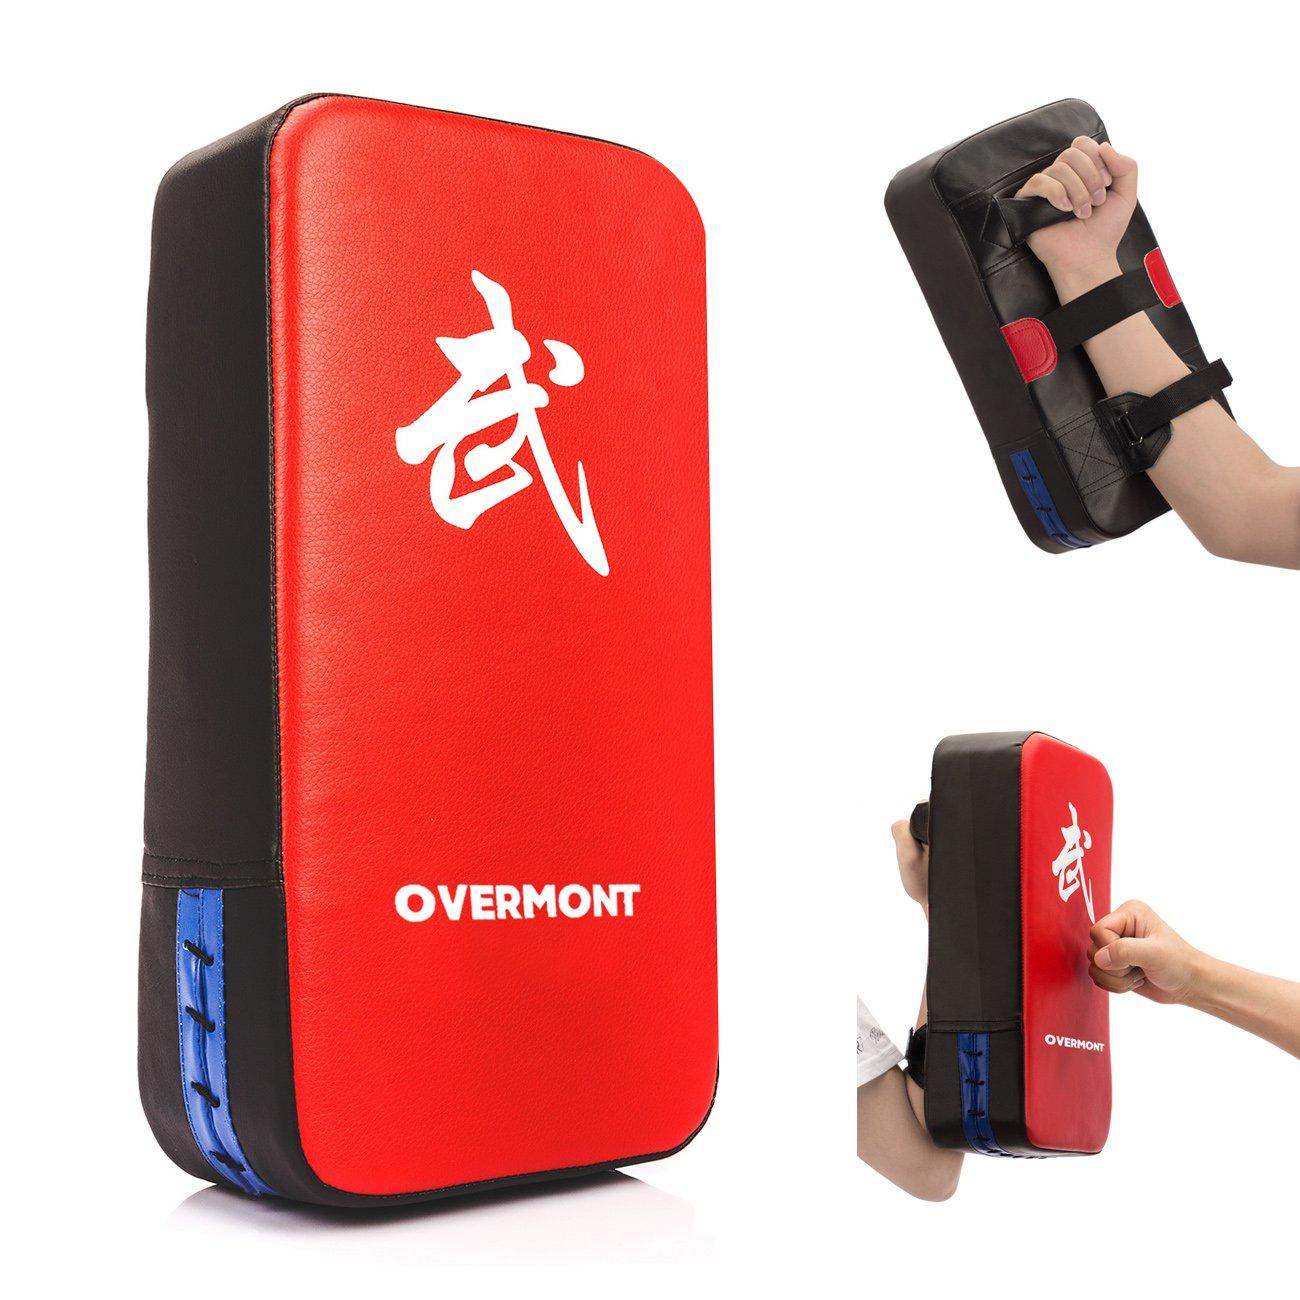 Sports & Entertainment 1pcs Boxing Pads Pu Leather Rectangle Kicking Strike Punching Pad Arm Shield Target For Focus Training Of Karate Muay Thai Kick Punching Bag & Sand Bag